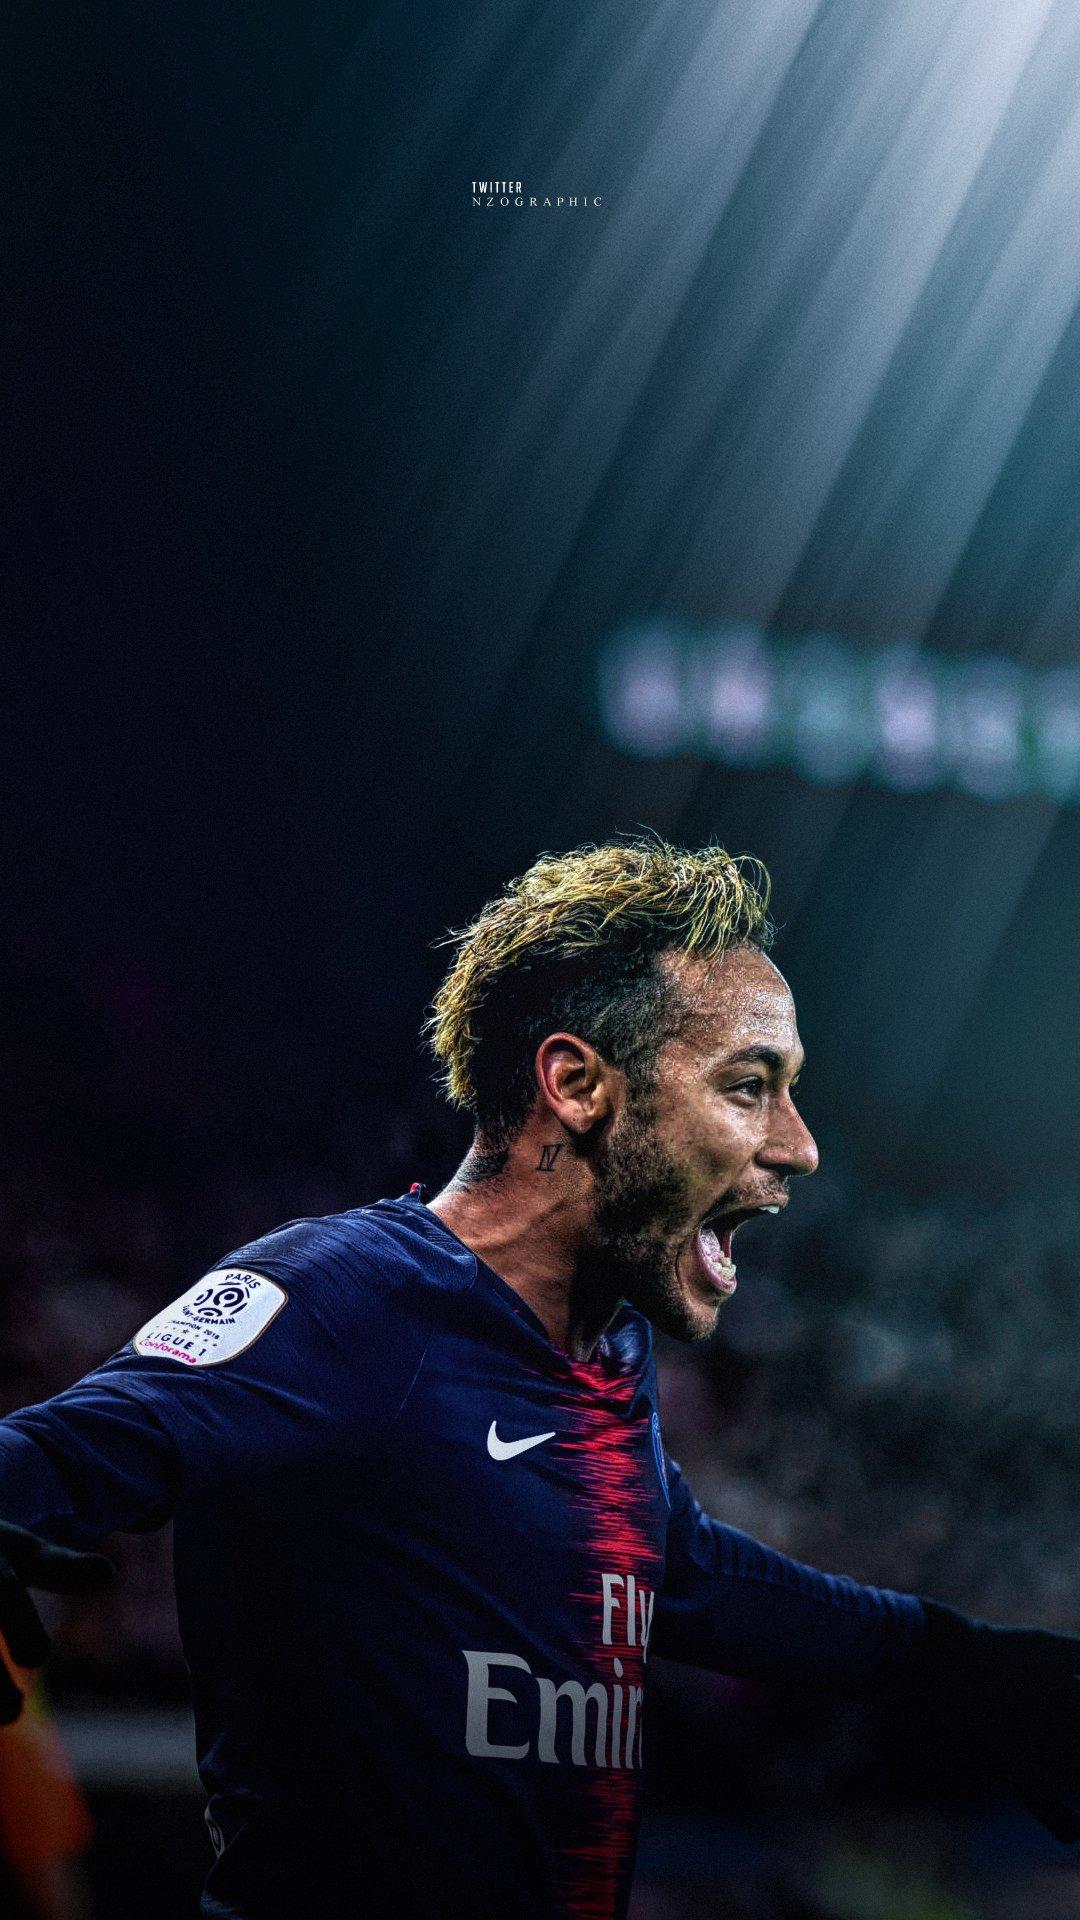 Neymar Njr Wallpaper 2019 (#2261791) - HD Wallpaper u0026 Backgrounds